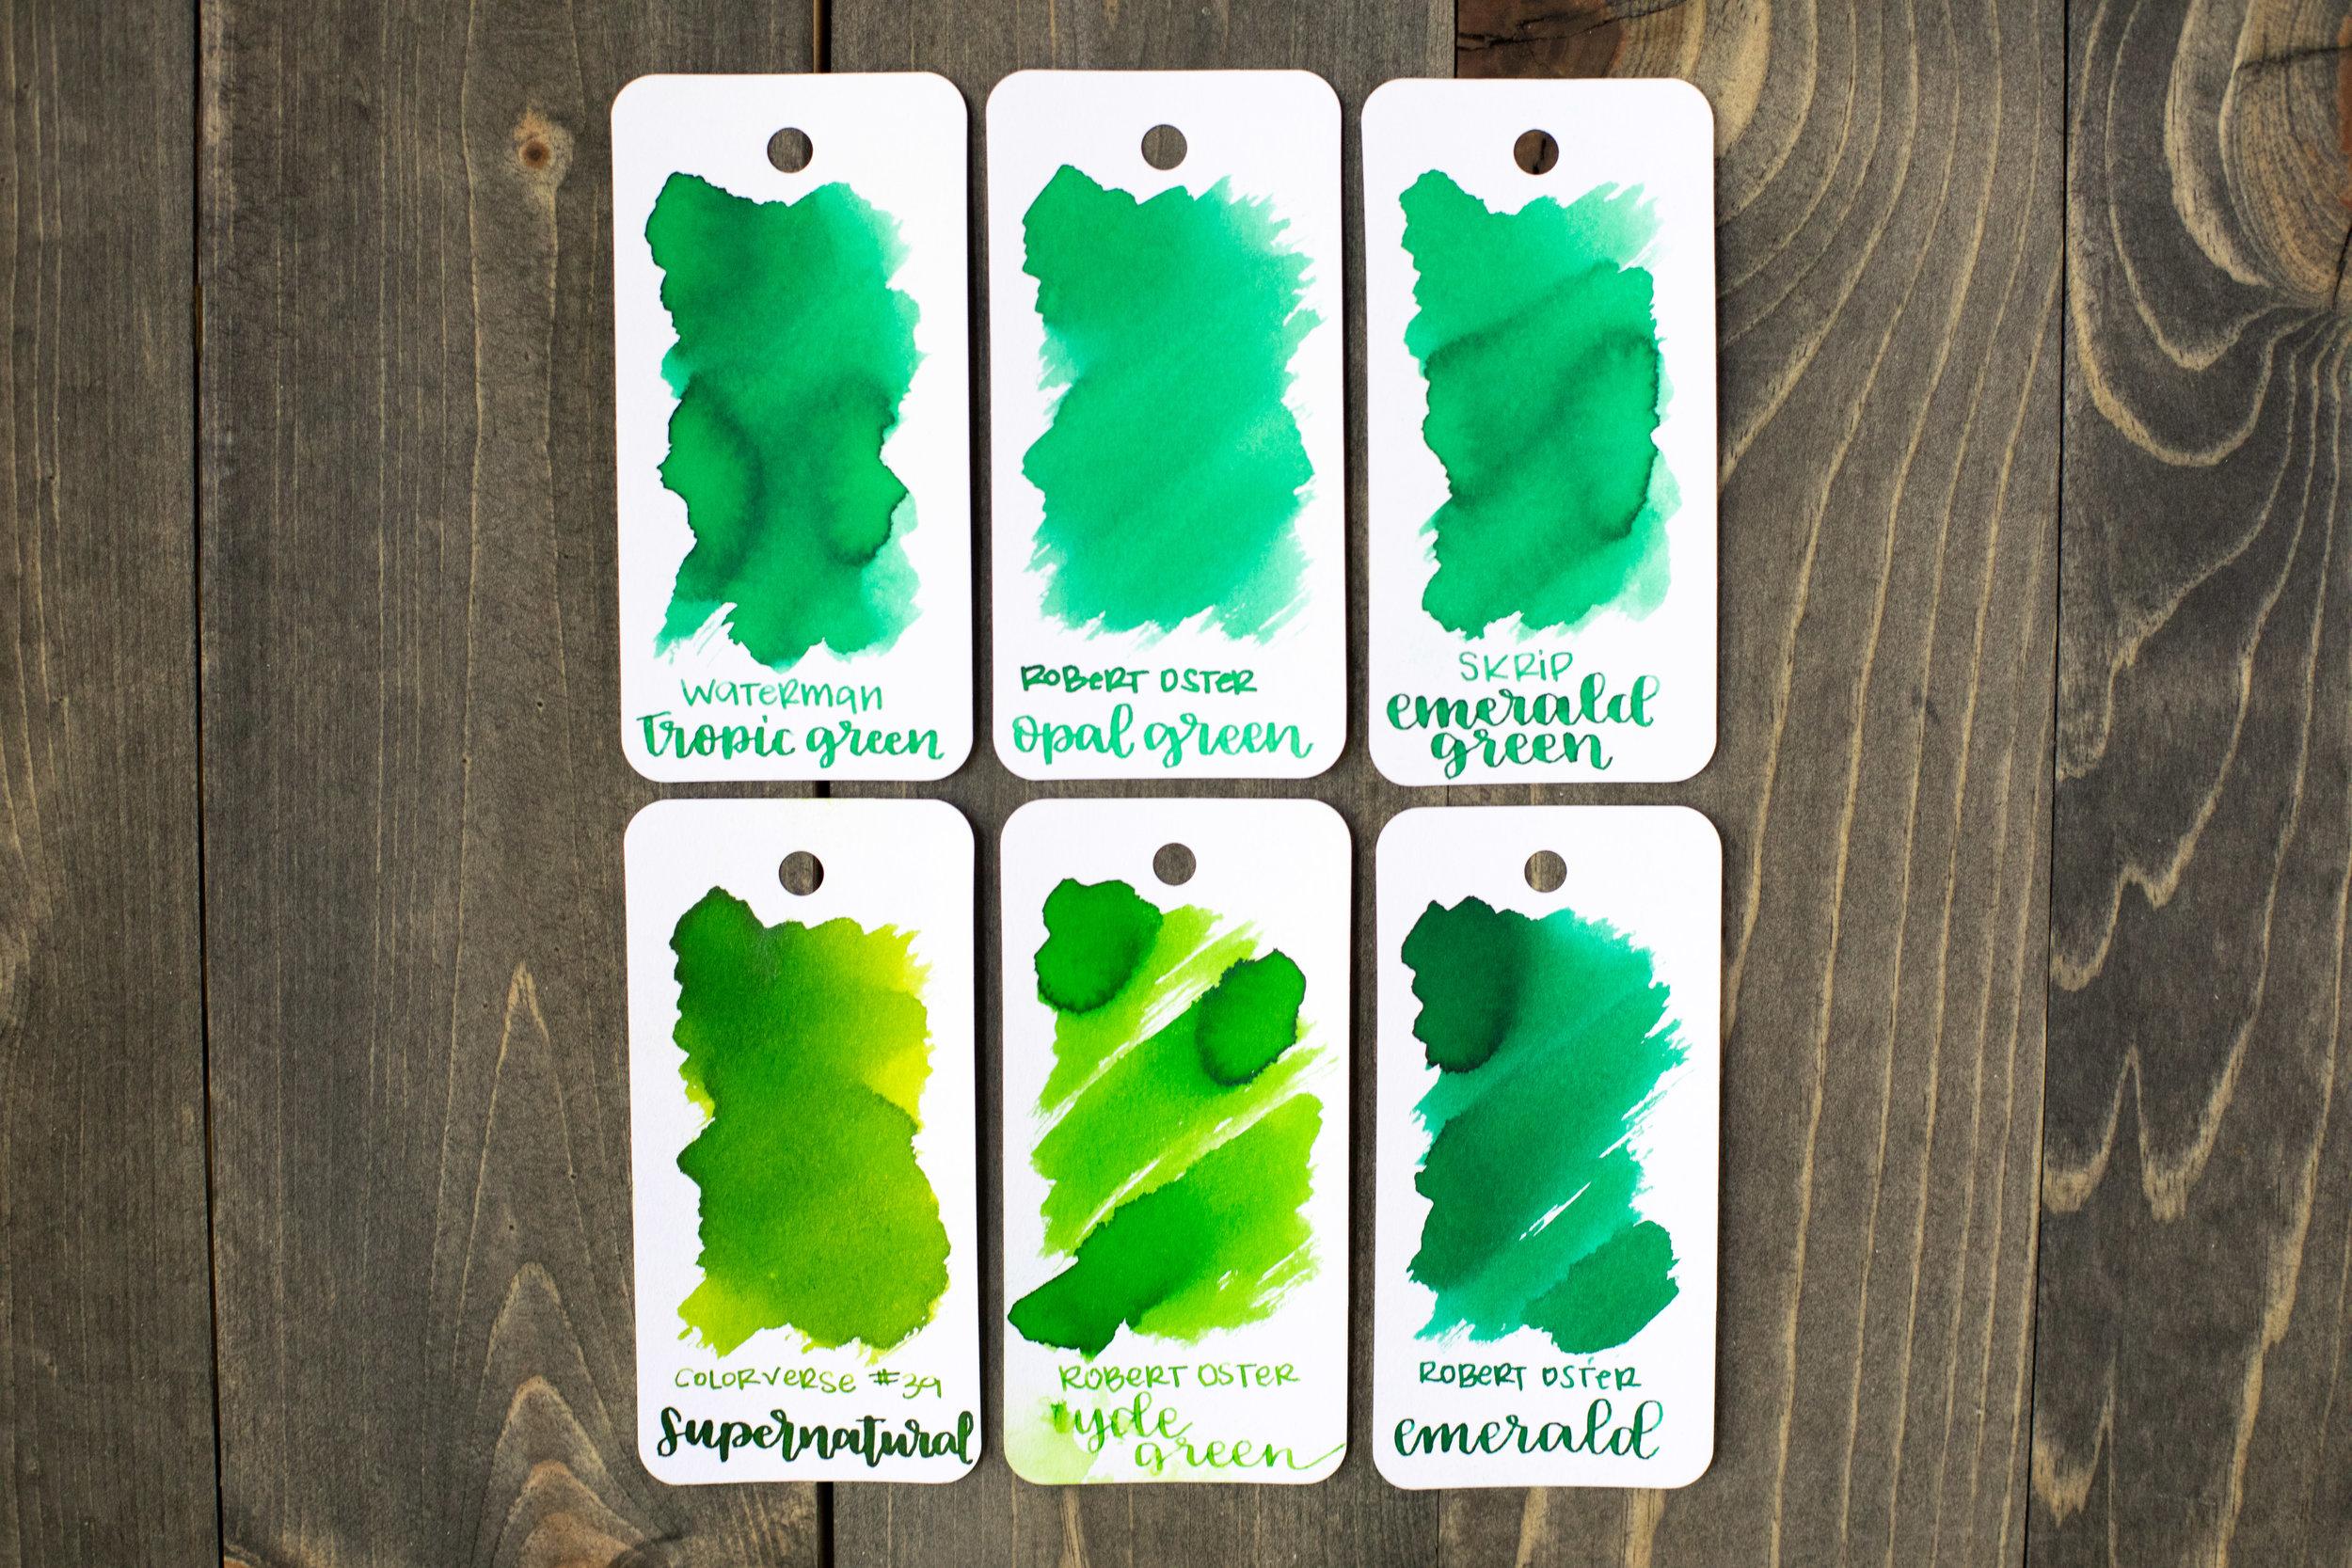 ro-opal-green-w-1.jpg